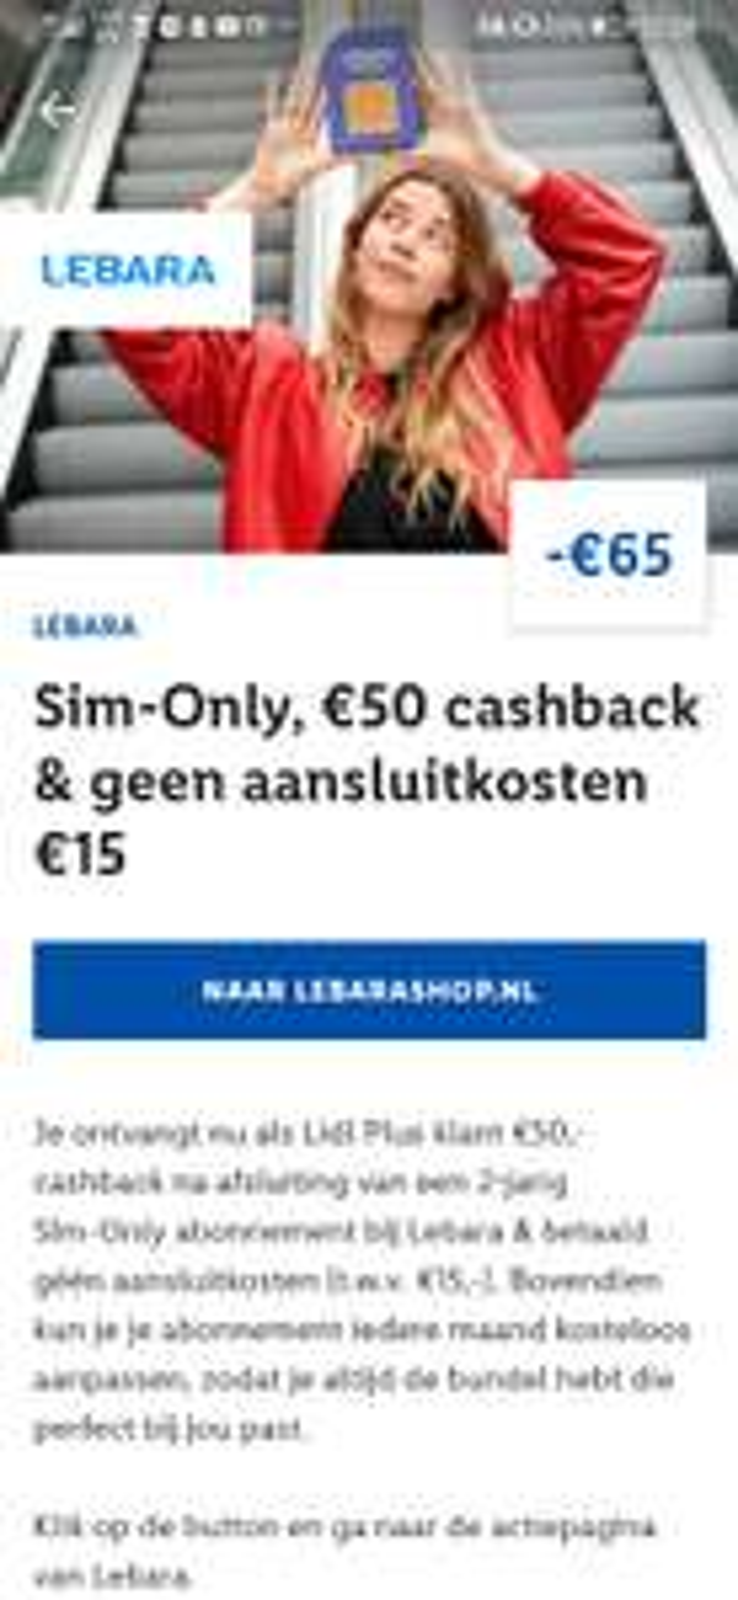 Sim-only Lebara met €50,- cashback @ Lidl Plus app